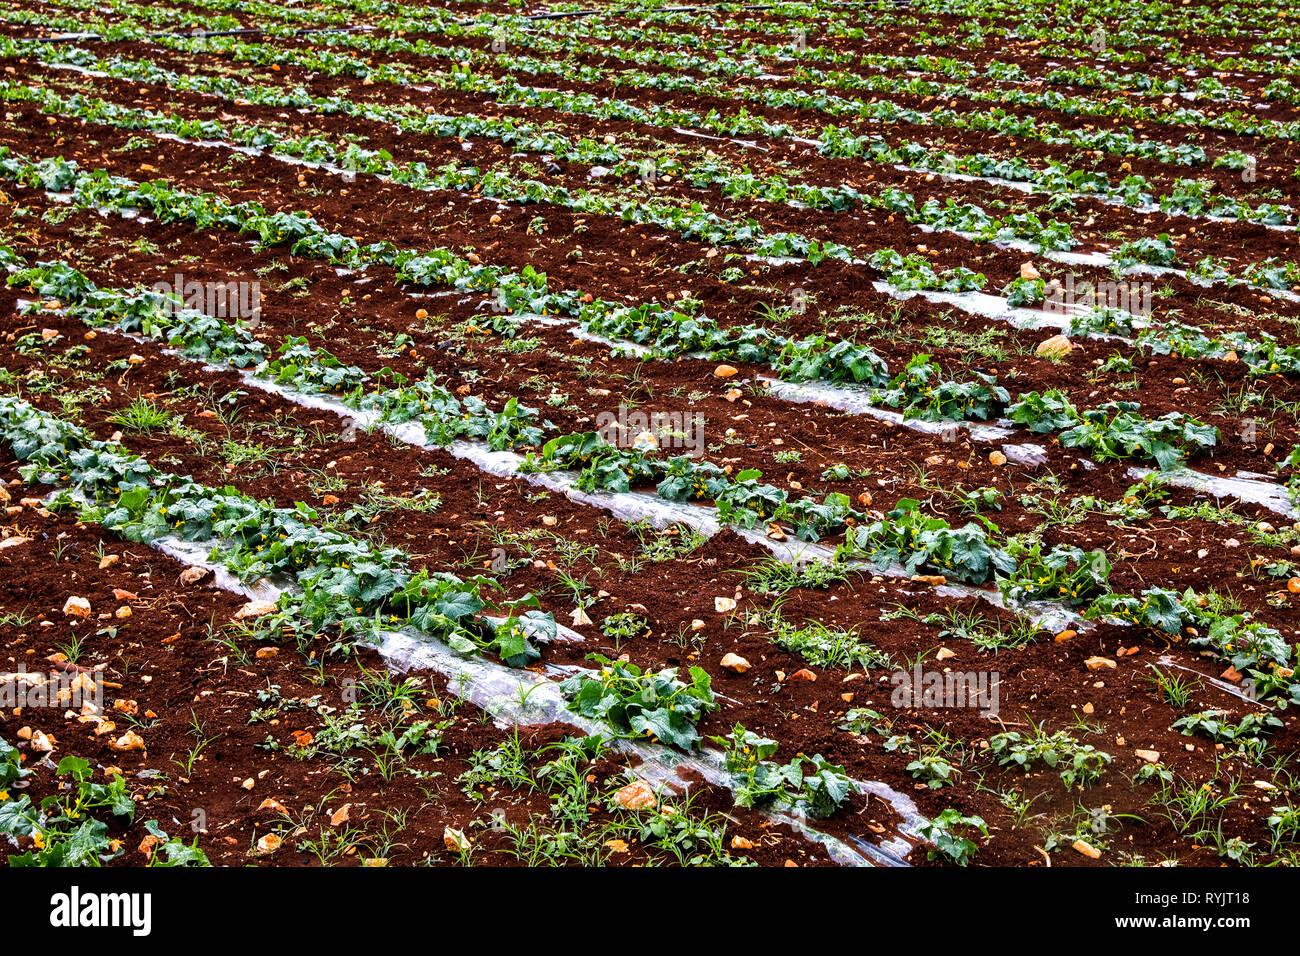 Field belonging to Aiman Mohammed Omar Dararmi, a client of ACAD Finance, in Ras al Farrah, West Bank, Palestine. - Stock Image